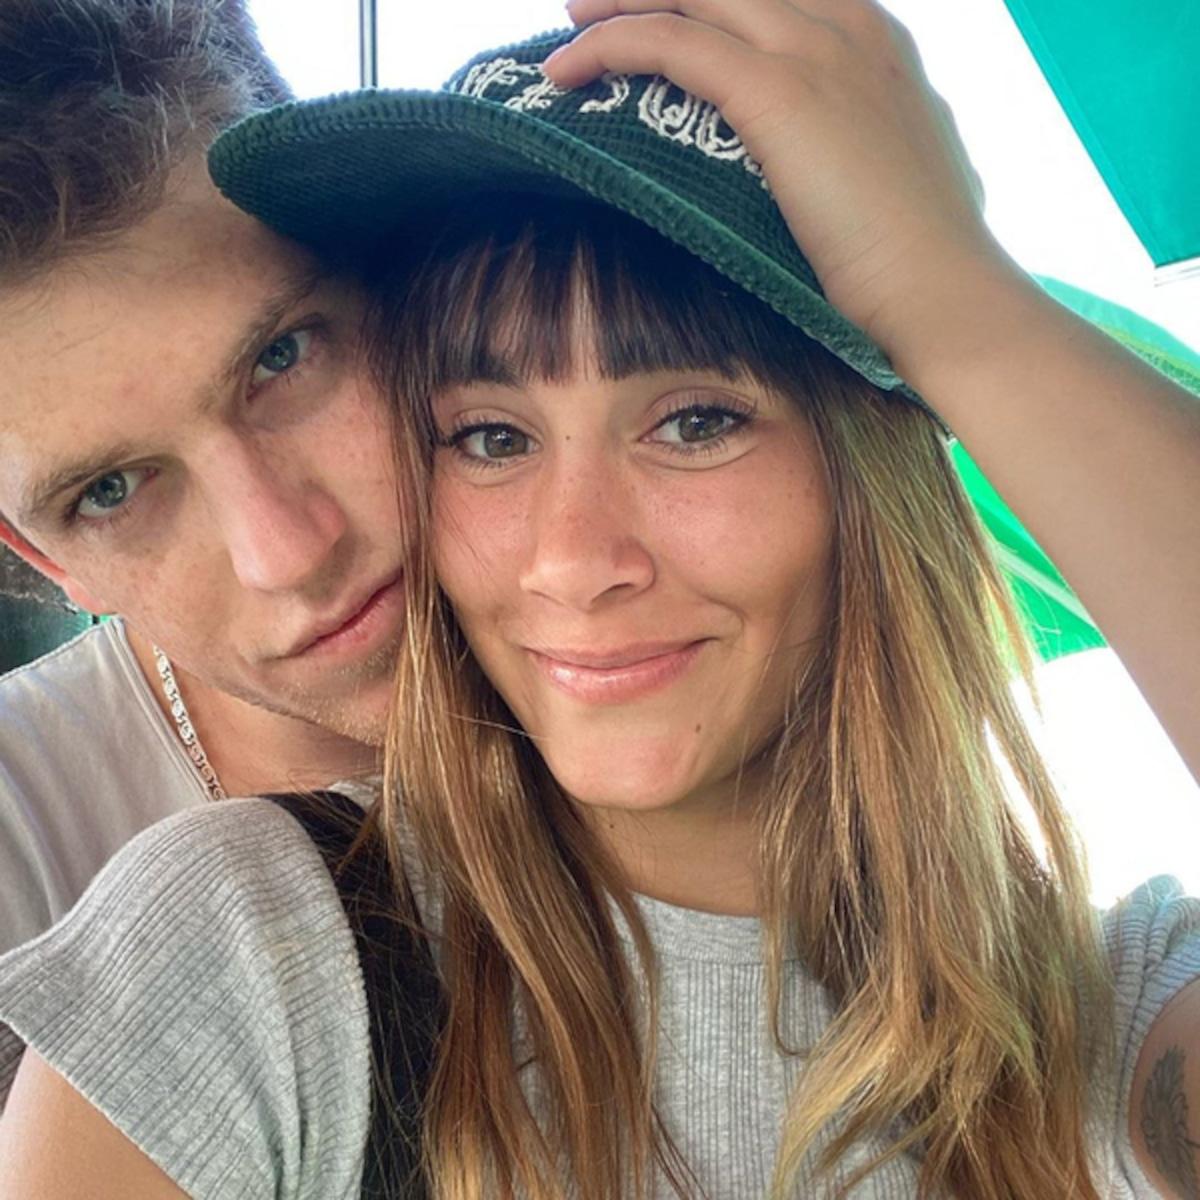 Así ha sido la historia de amor de Aitana y Miguel Bernardeau - E! Online  Latino - MX